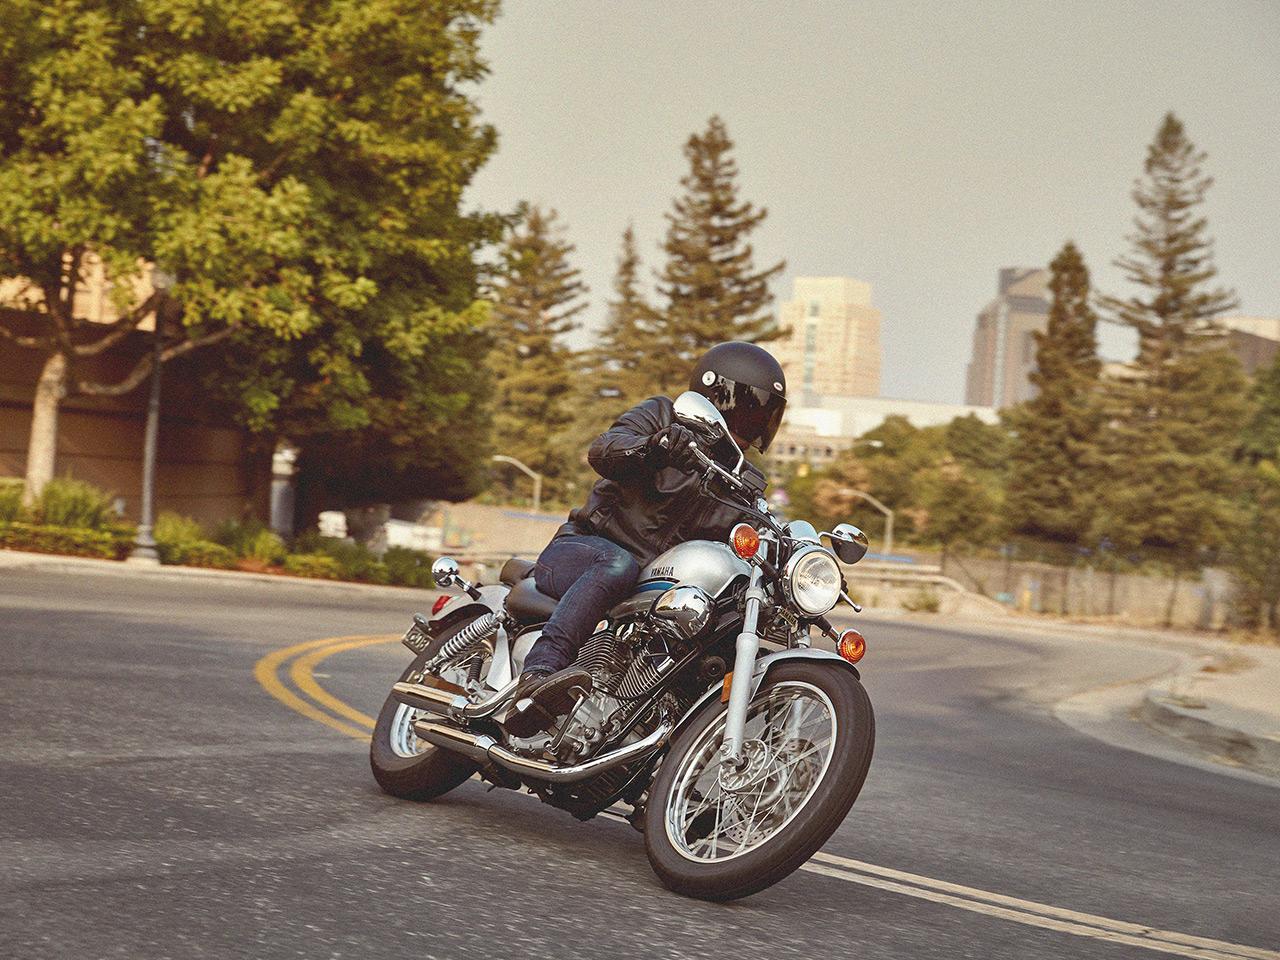 Yamaha XV250 motorcycle riding on the road